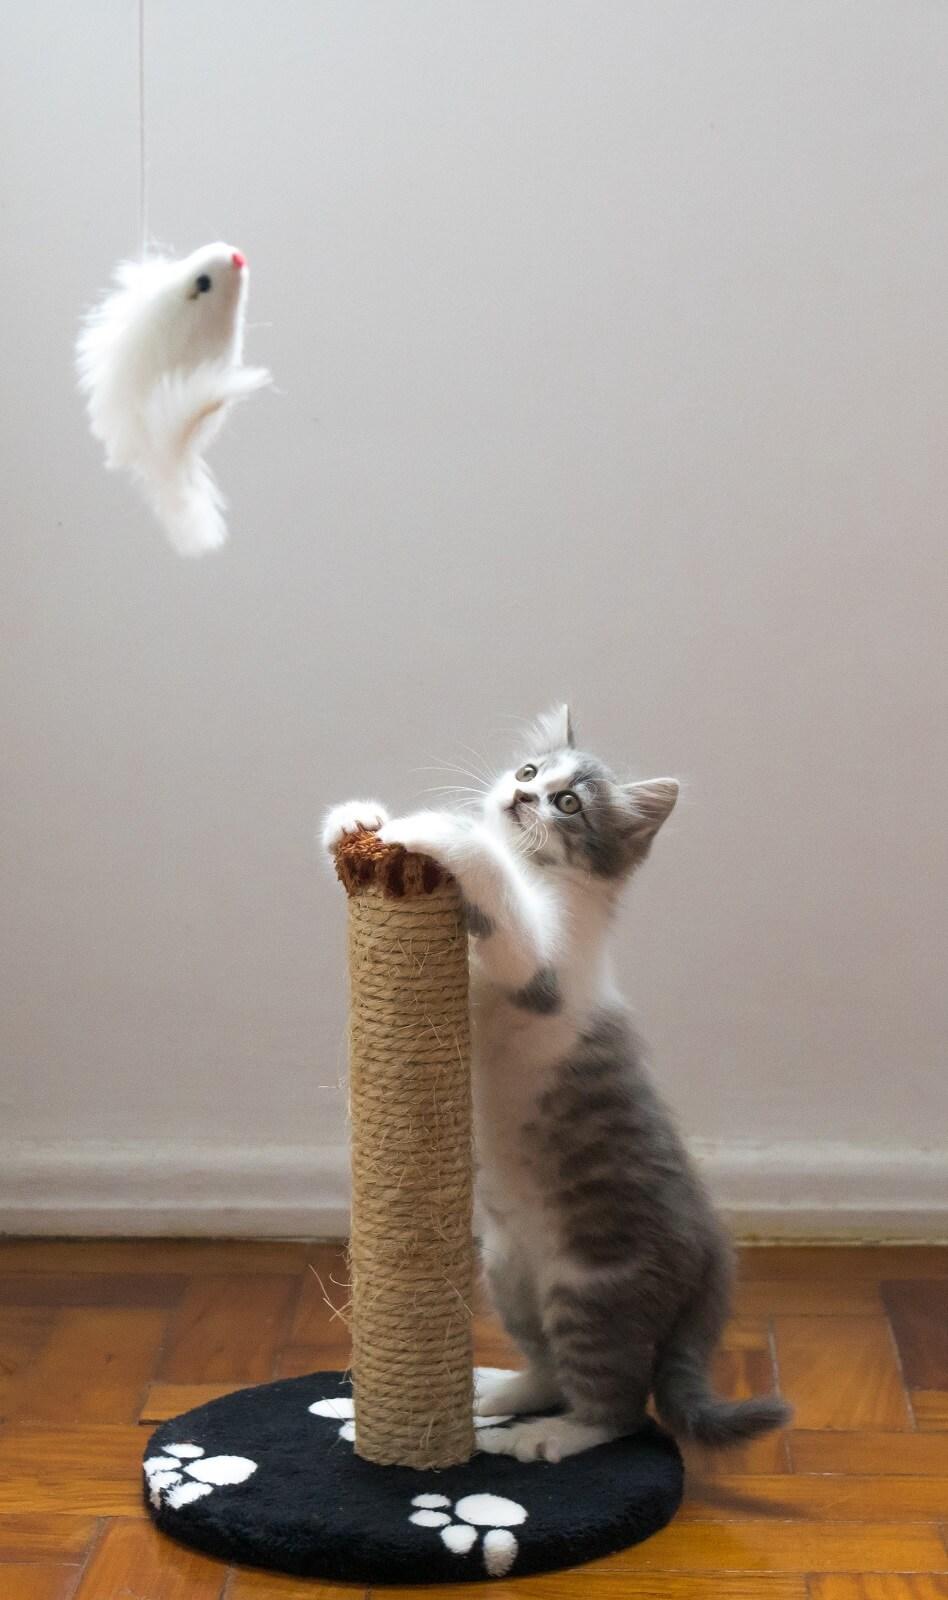 Zabawka dla kota na wędce